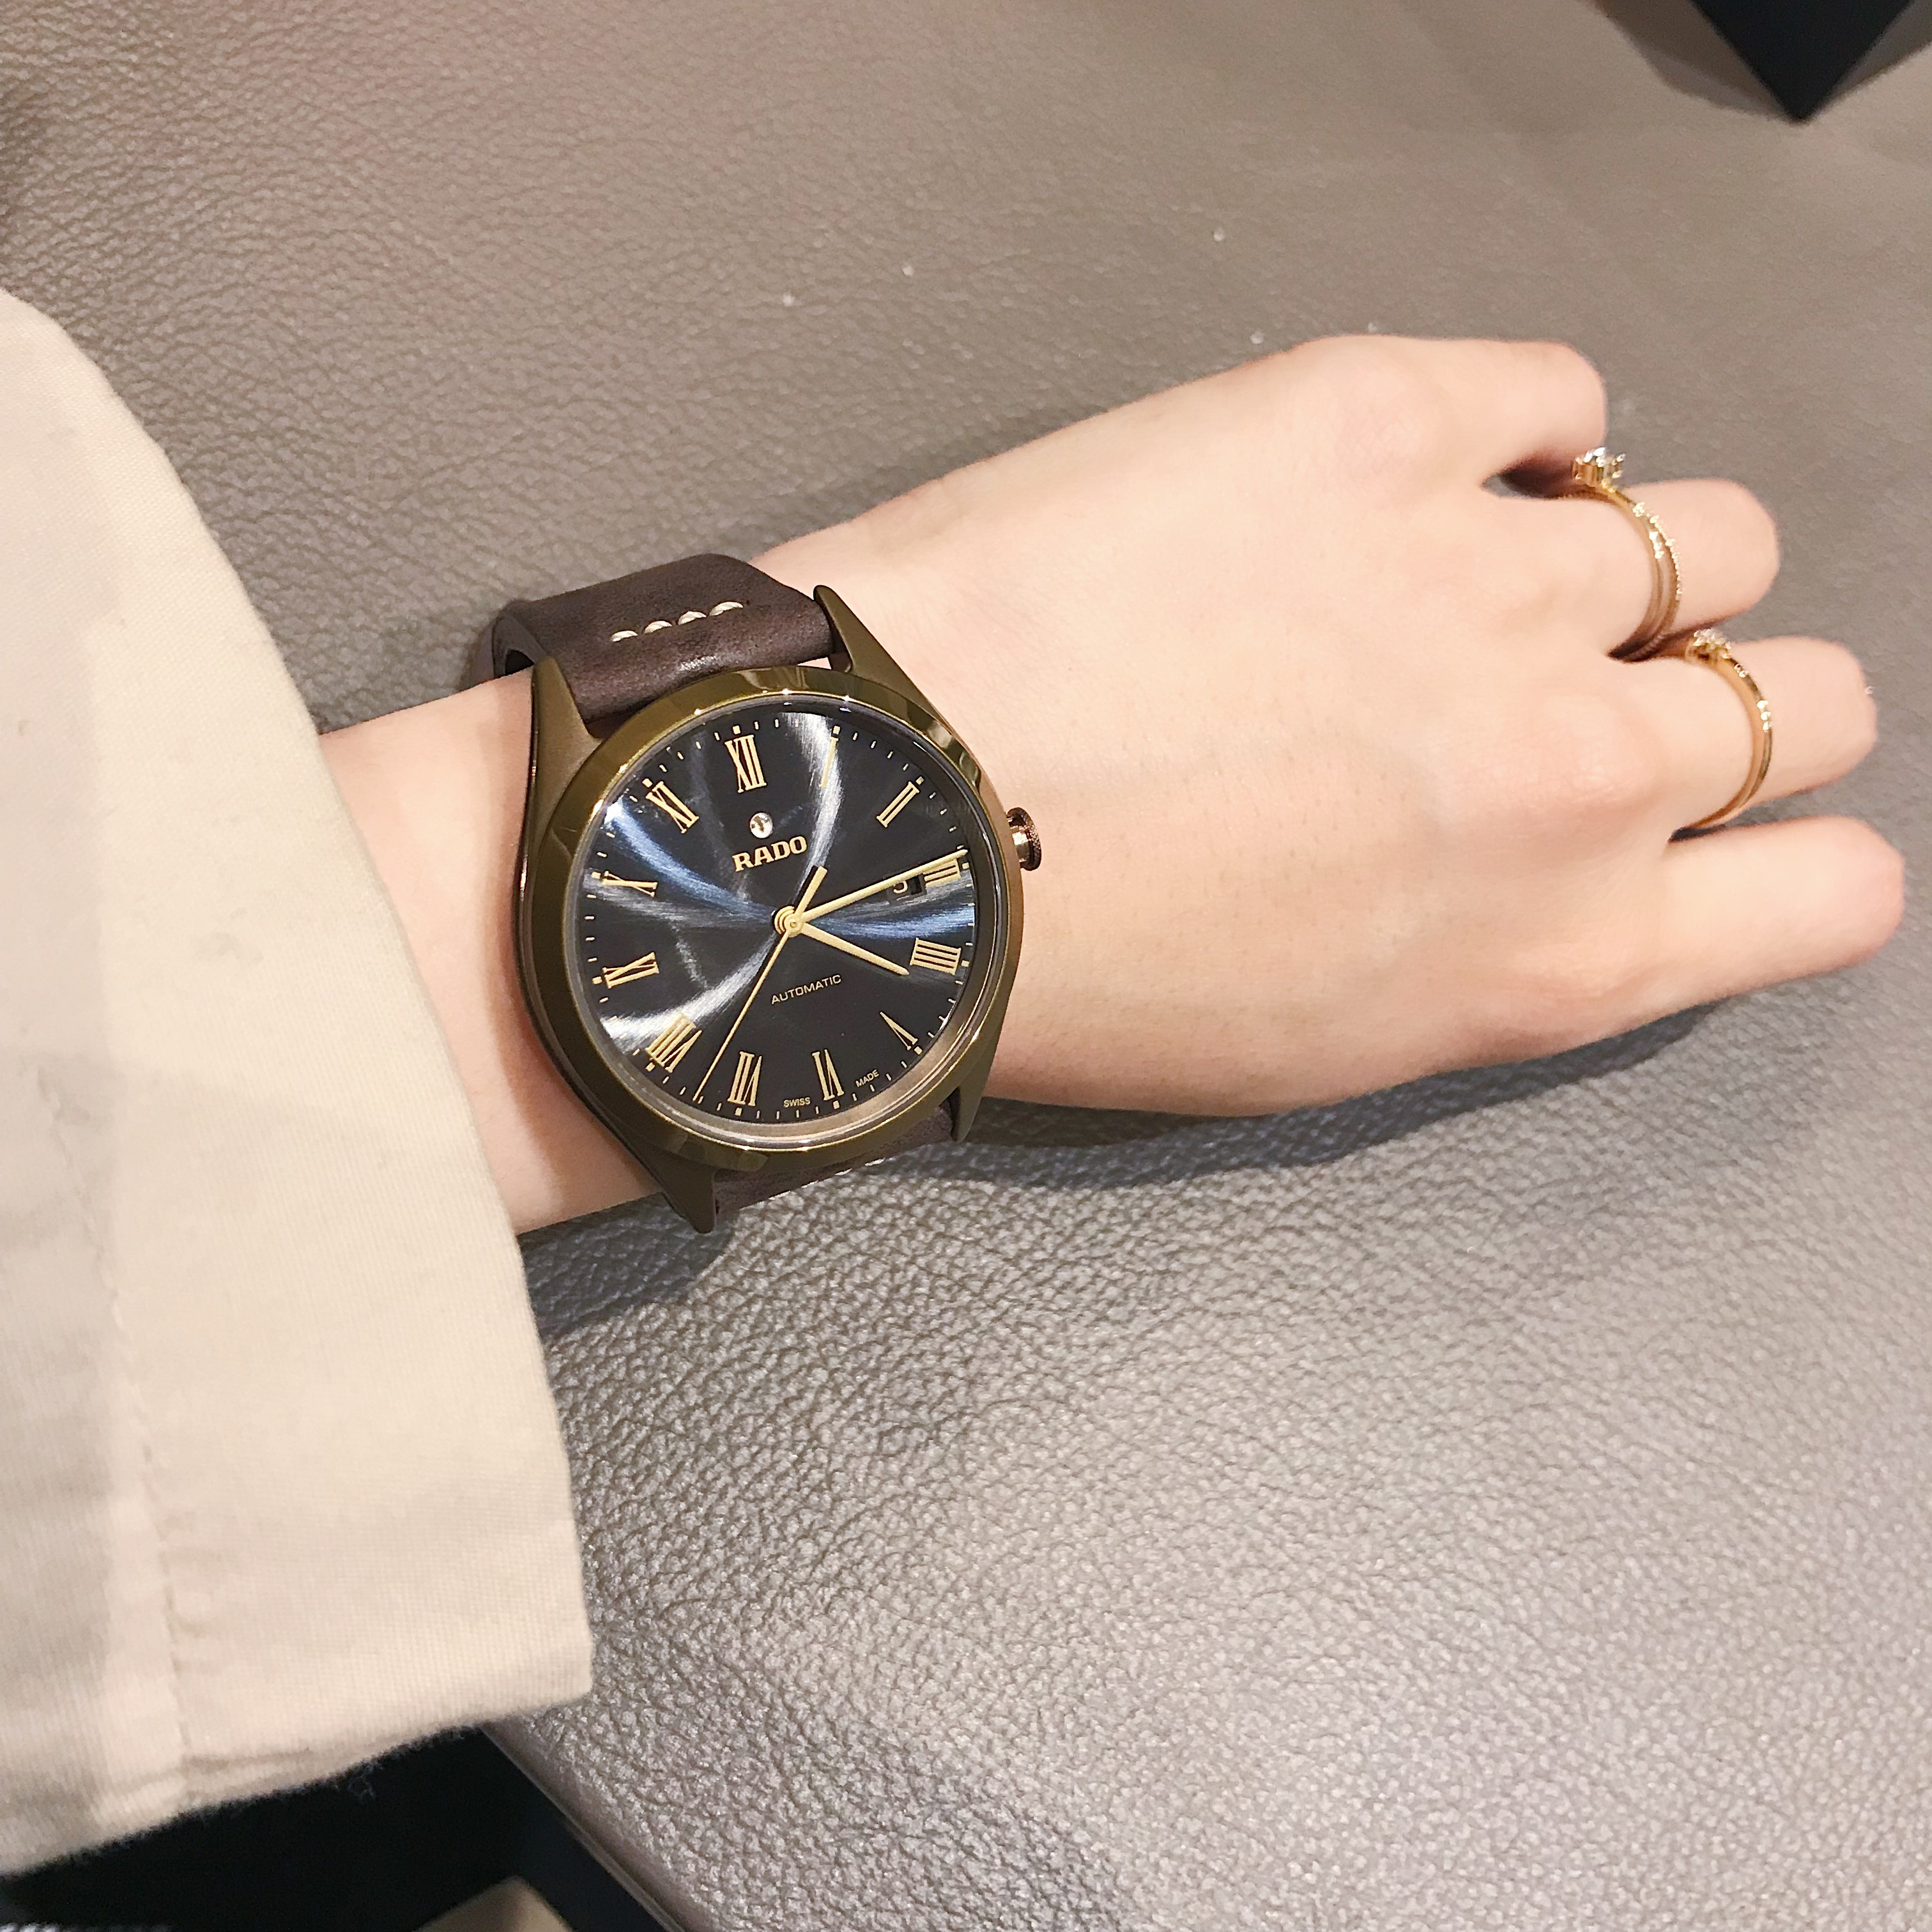 RADO 瑞士雷达表推出全新腕表